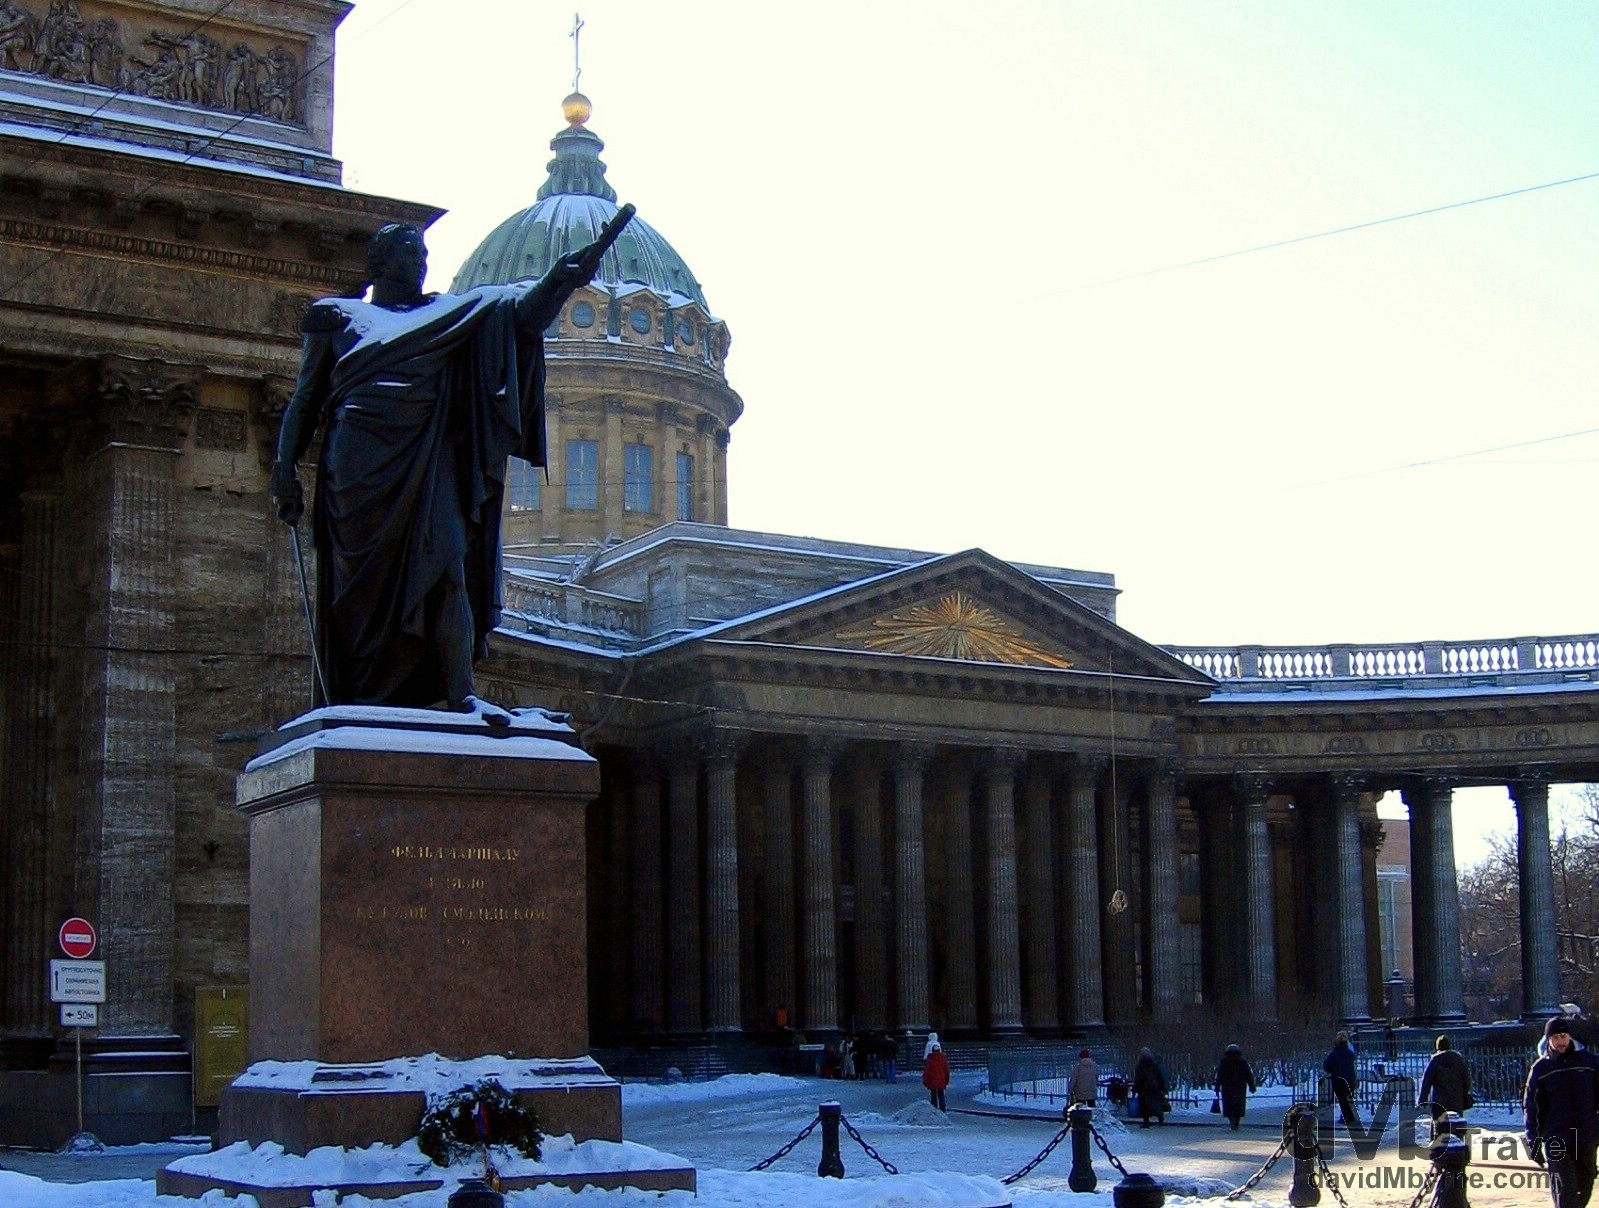 Kazan Cathedral, Nevsky Prospekt, St. Petersburg, Russia. February 27, 2006.